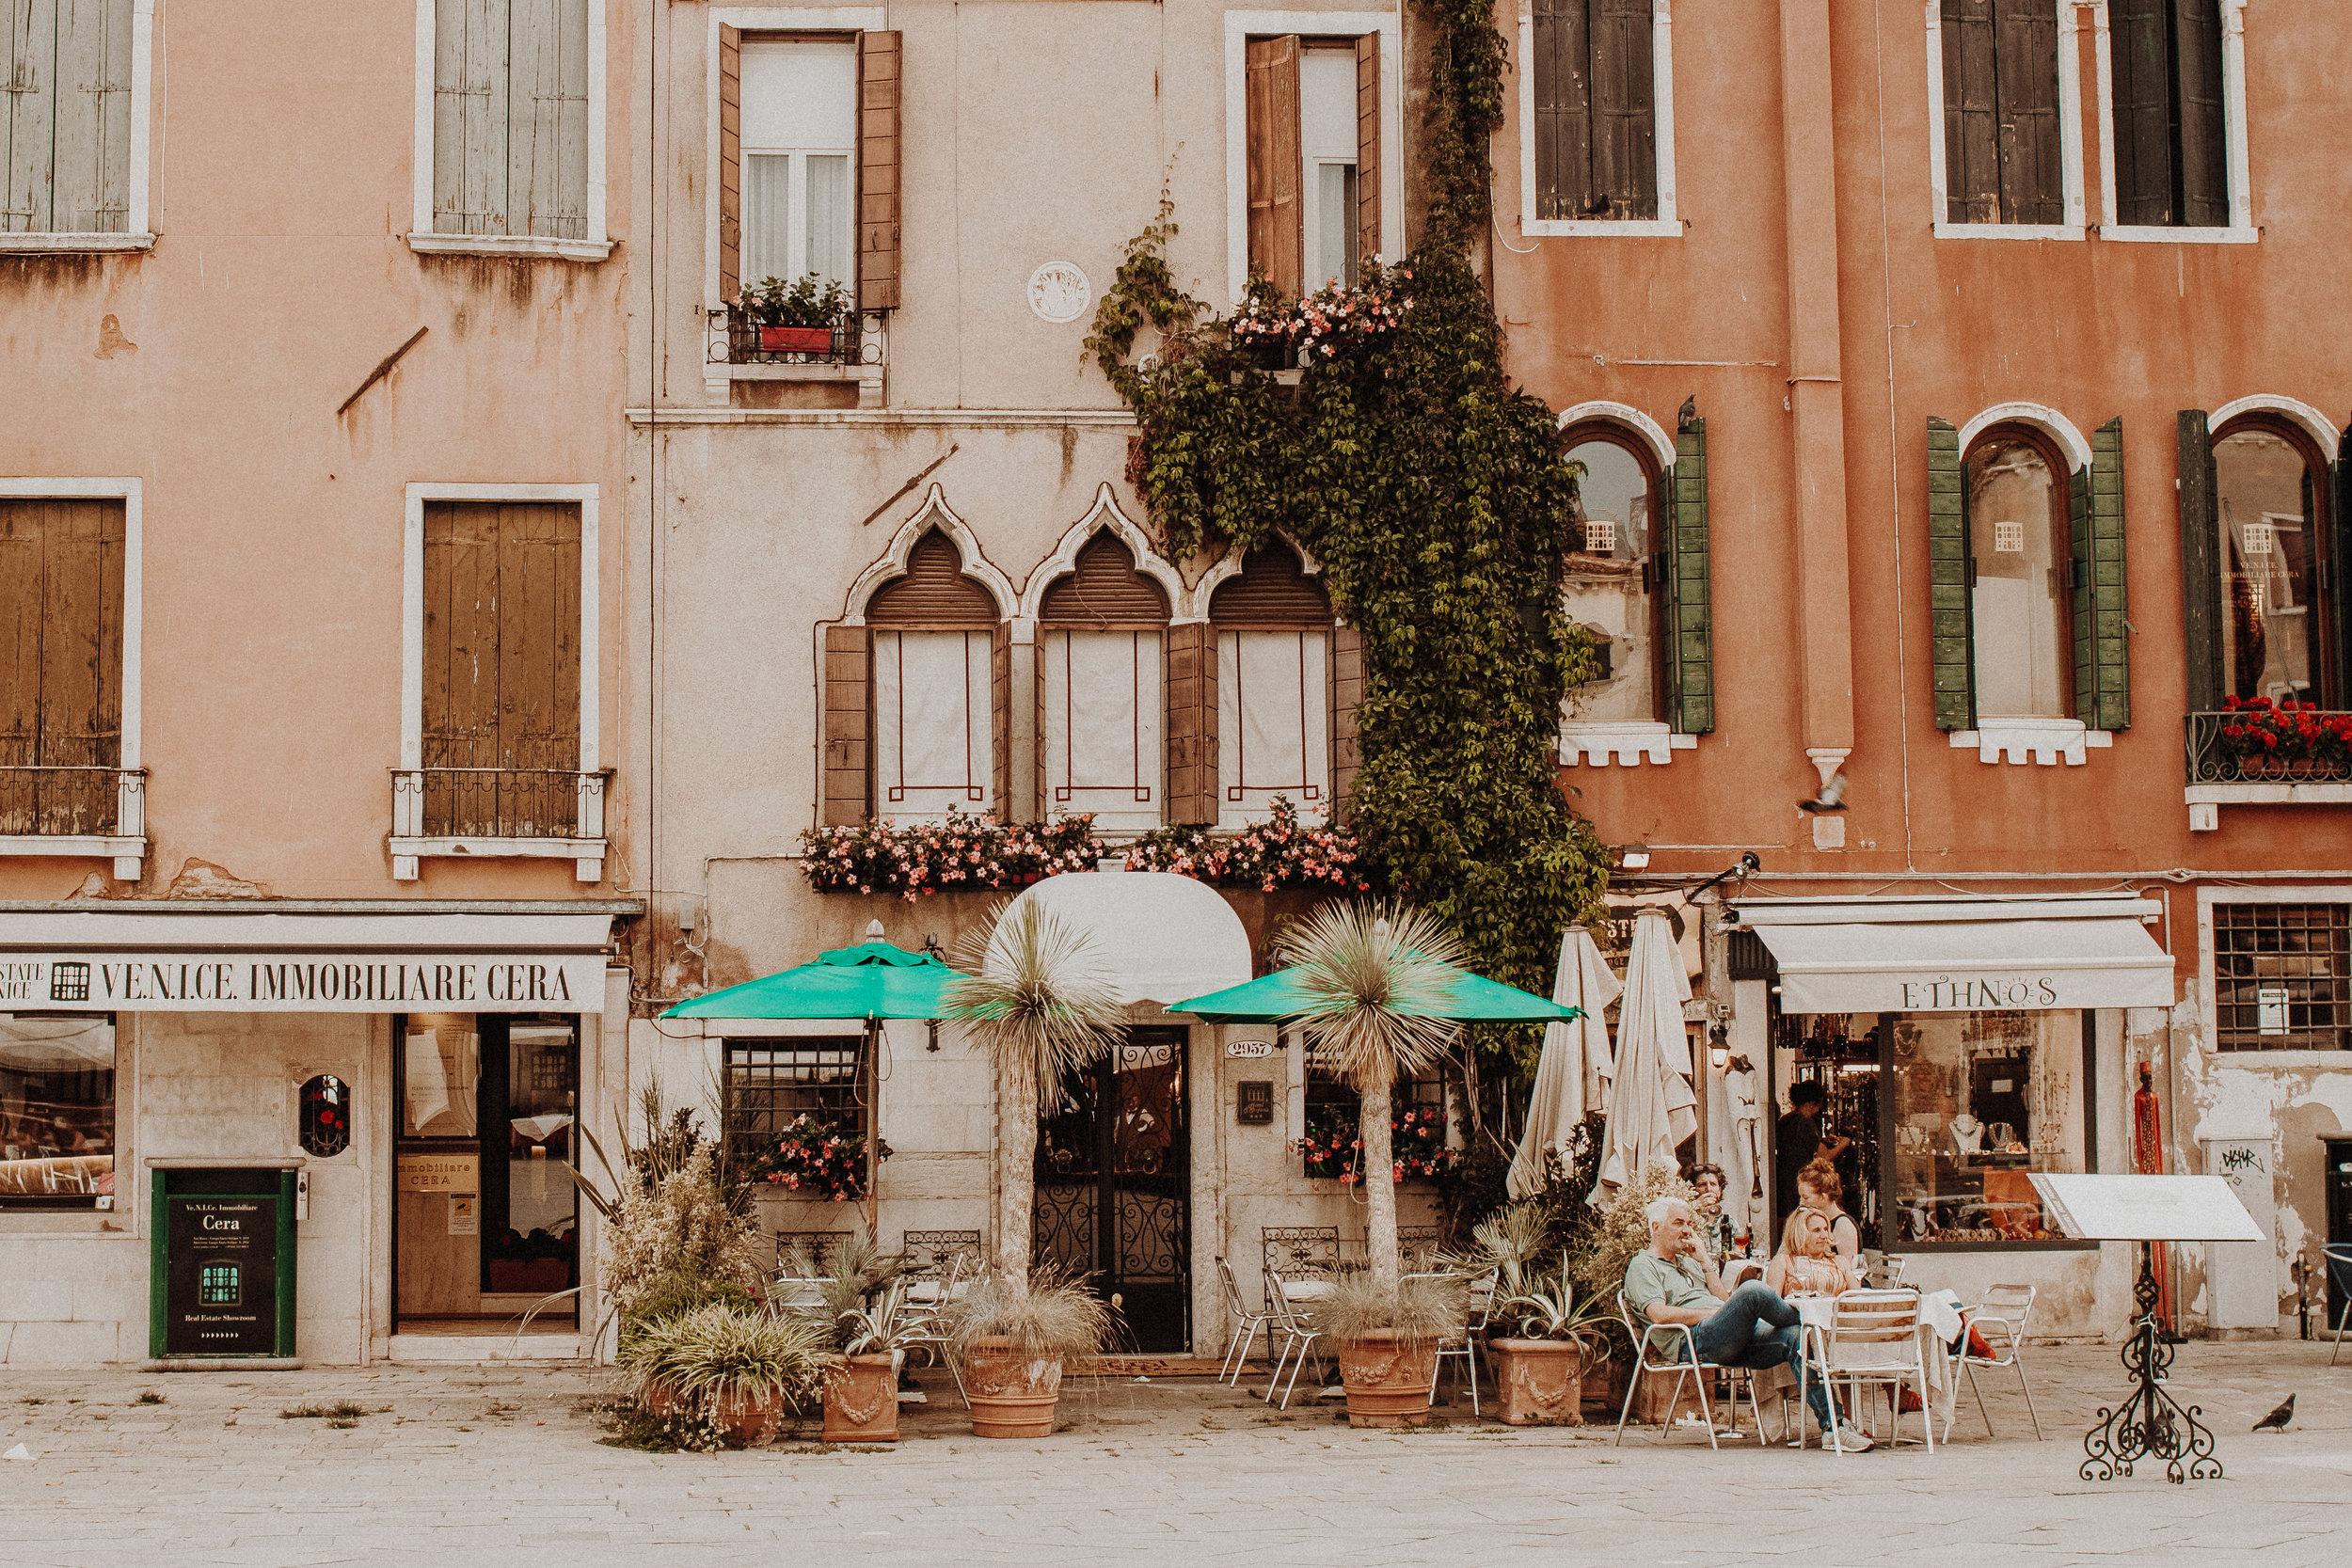 Visiting Venice, Italy: A 24 Hour Itinerary - Venice, Italy